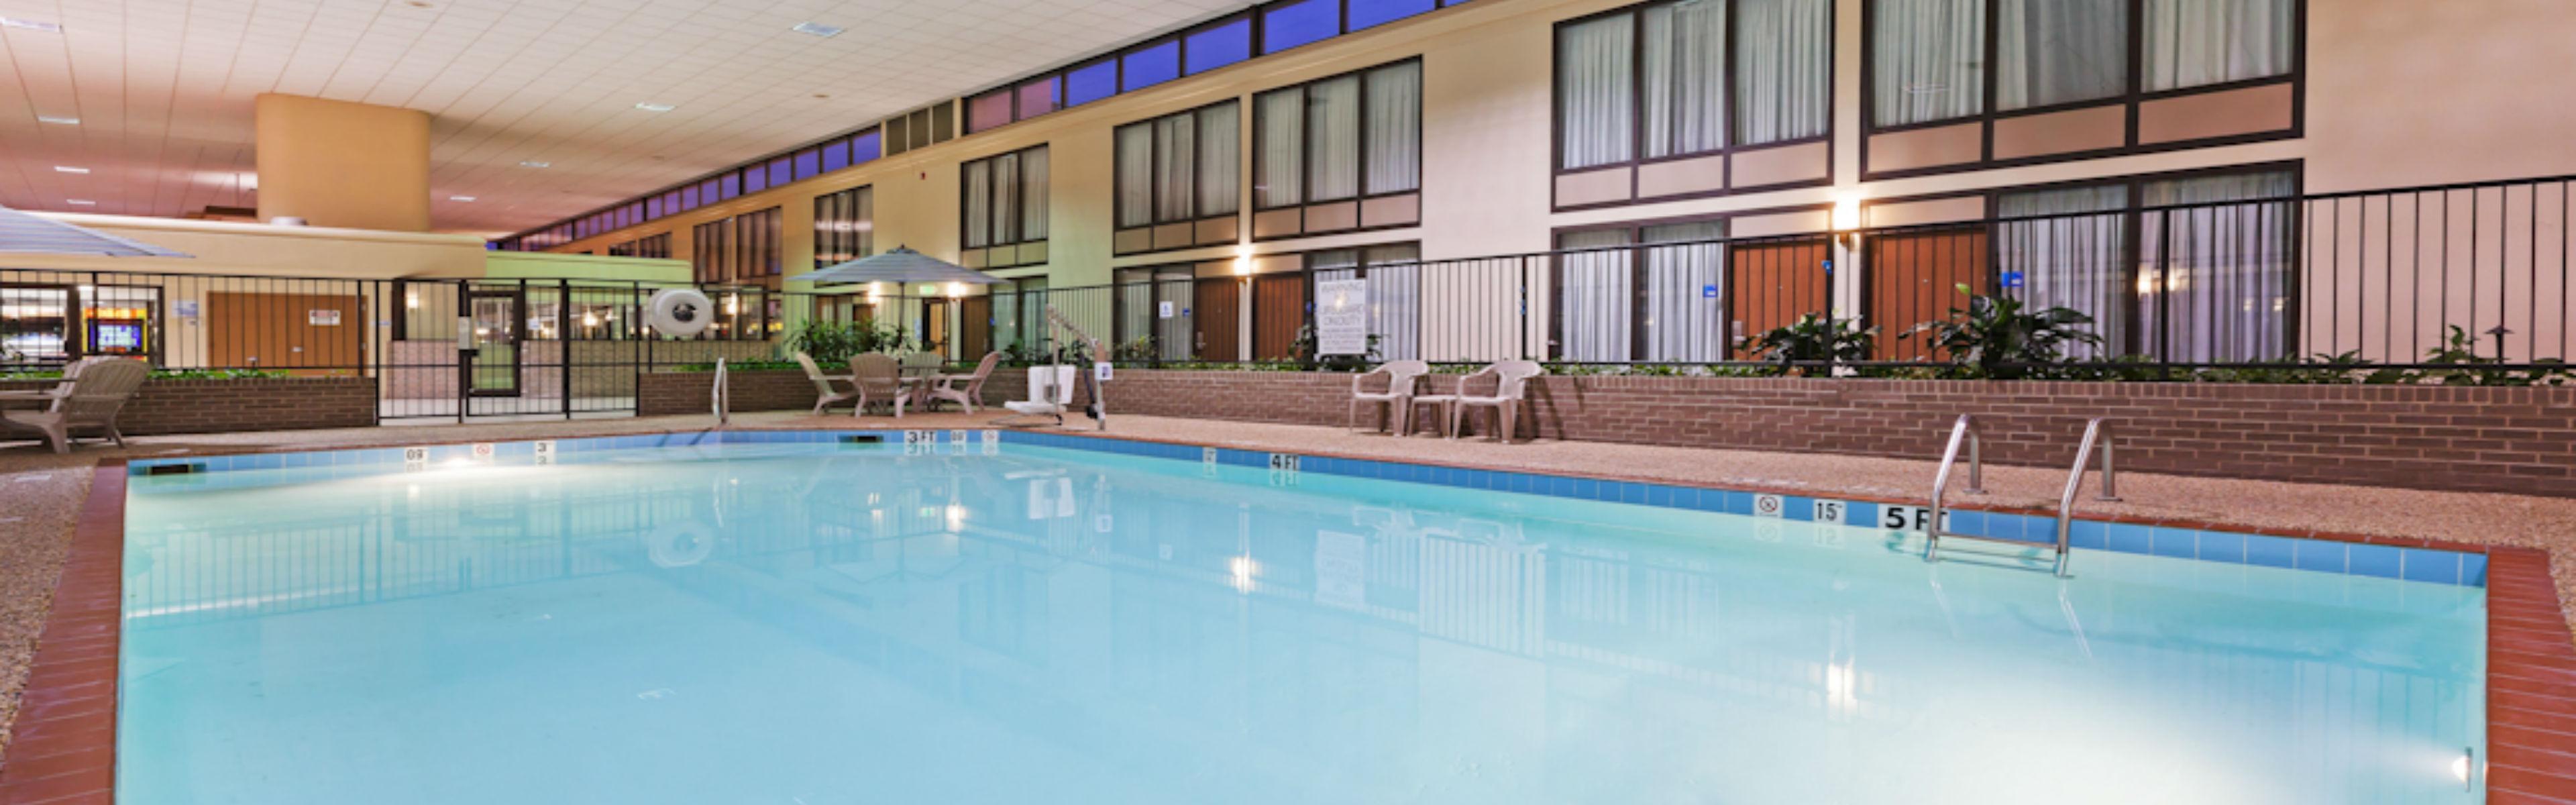 Holiday Inn Express Little Rock-Airport image 2